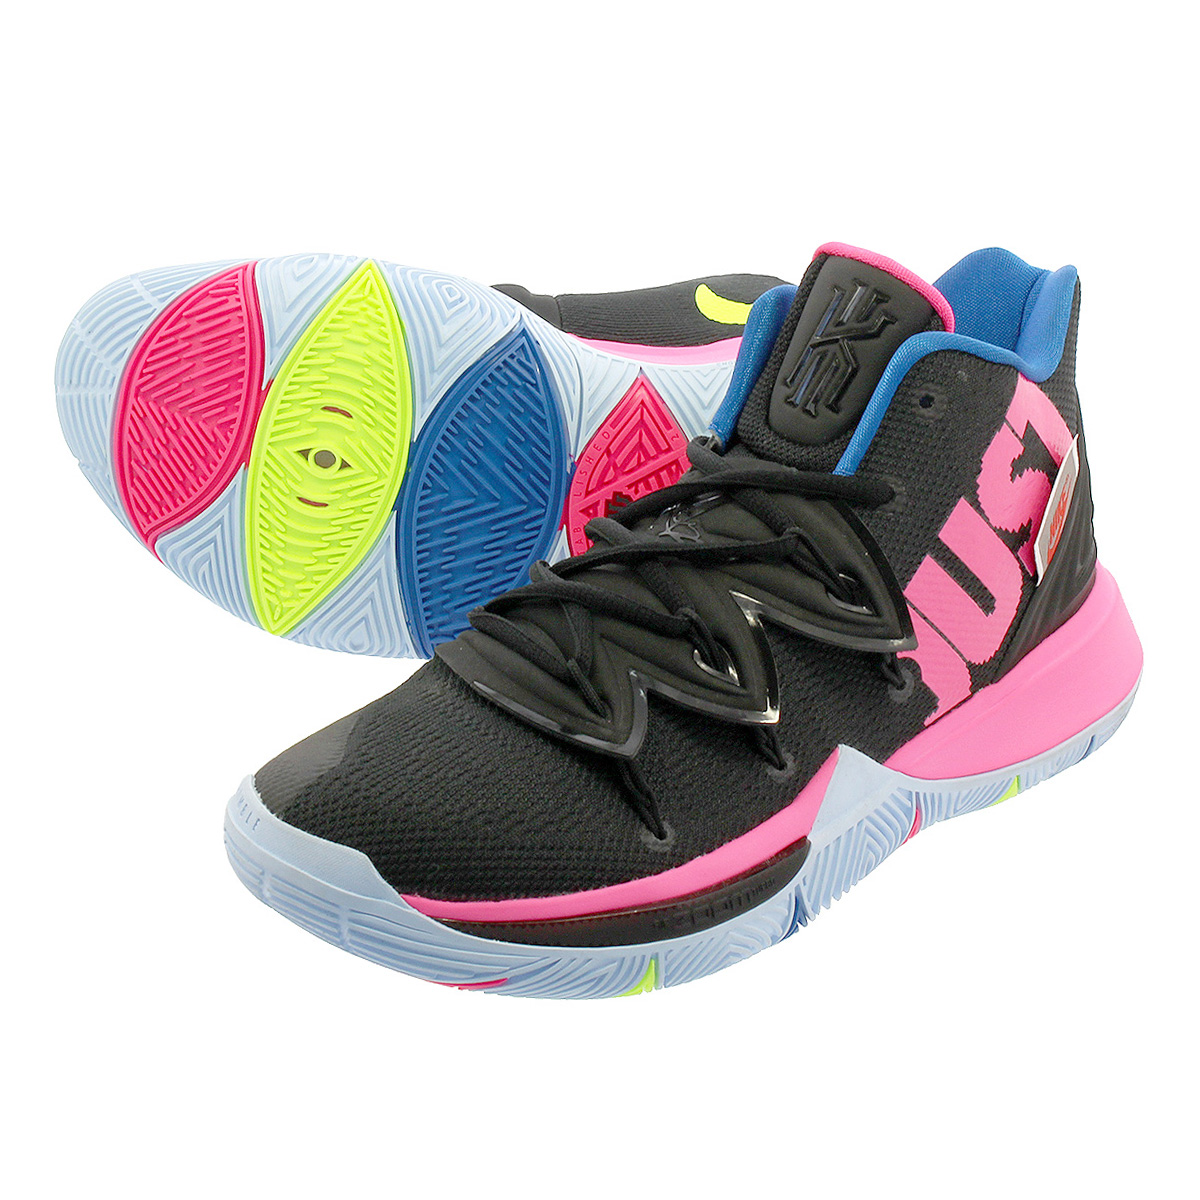 2e1105965b57 LOWTEX PLUS  NIKE KYRIE 5 Nike chi Lee 5 BLACK VOLT HYPER PINK ...